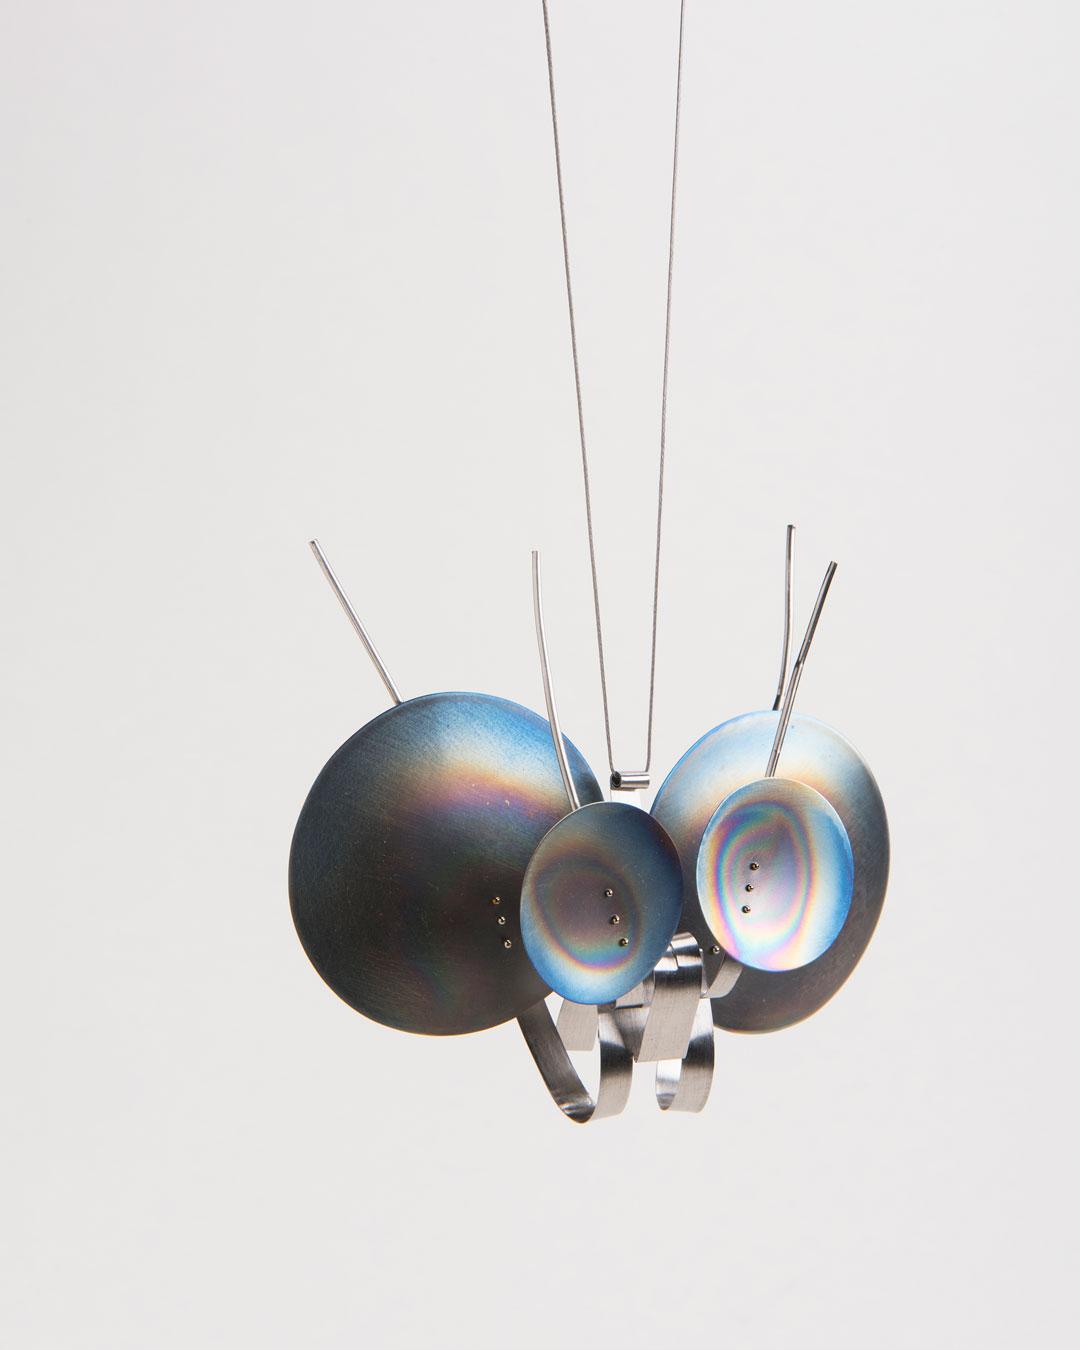 Andrea Wippermann, Eriocrania Subpurpurella, 2018, pendant; stainless steel, titanium, nylon, blackened silver, 110 x 120 x 35 mm, €2450